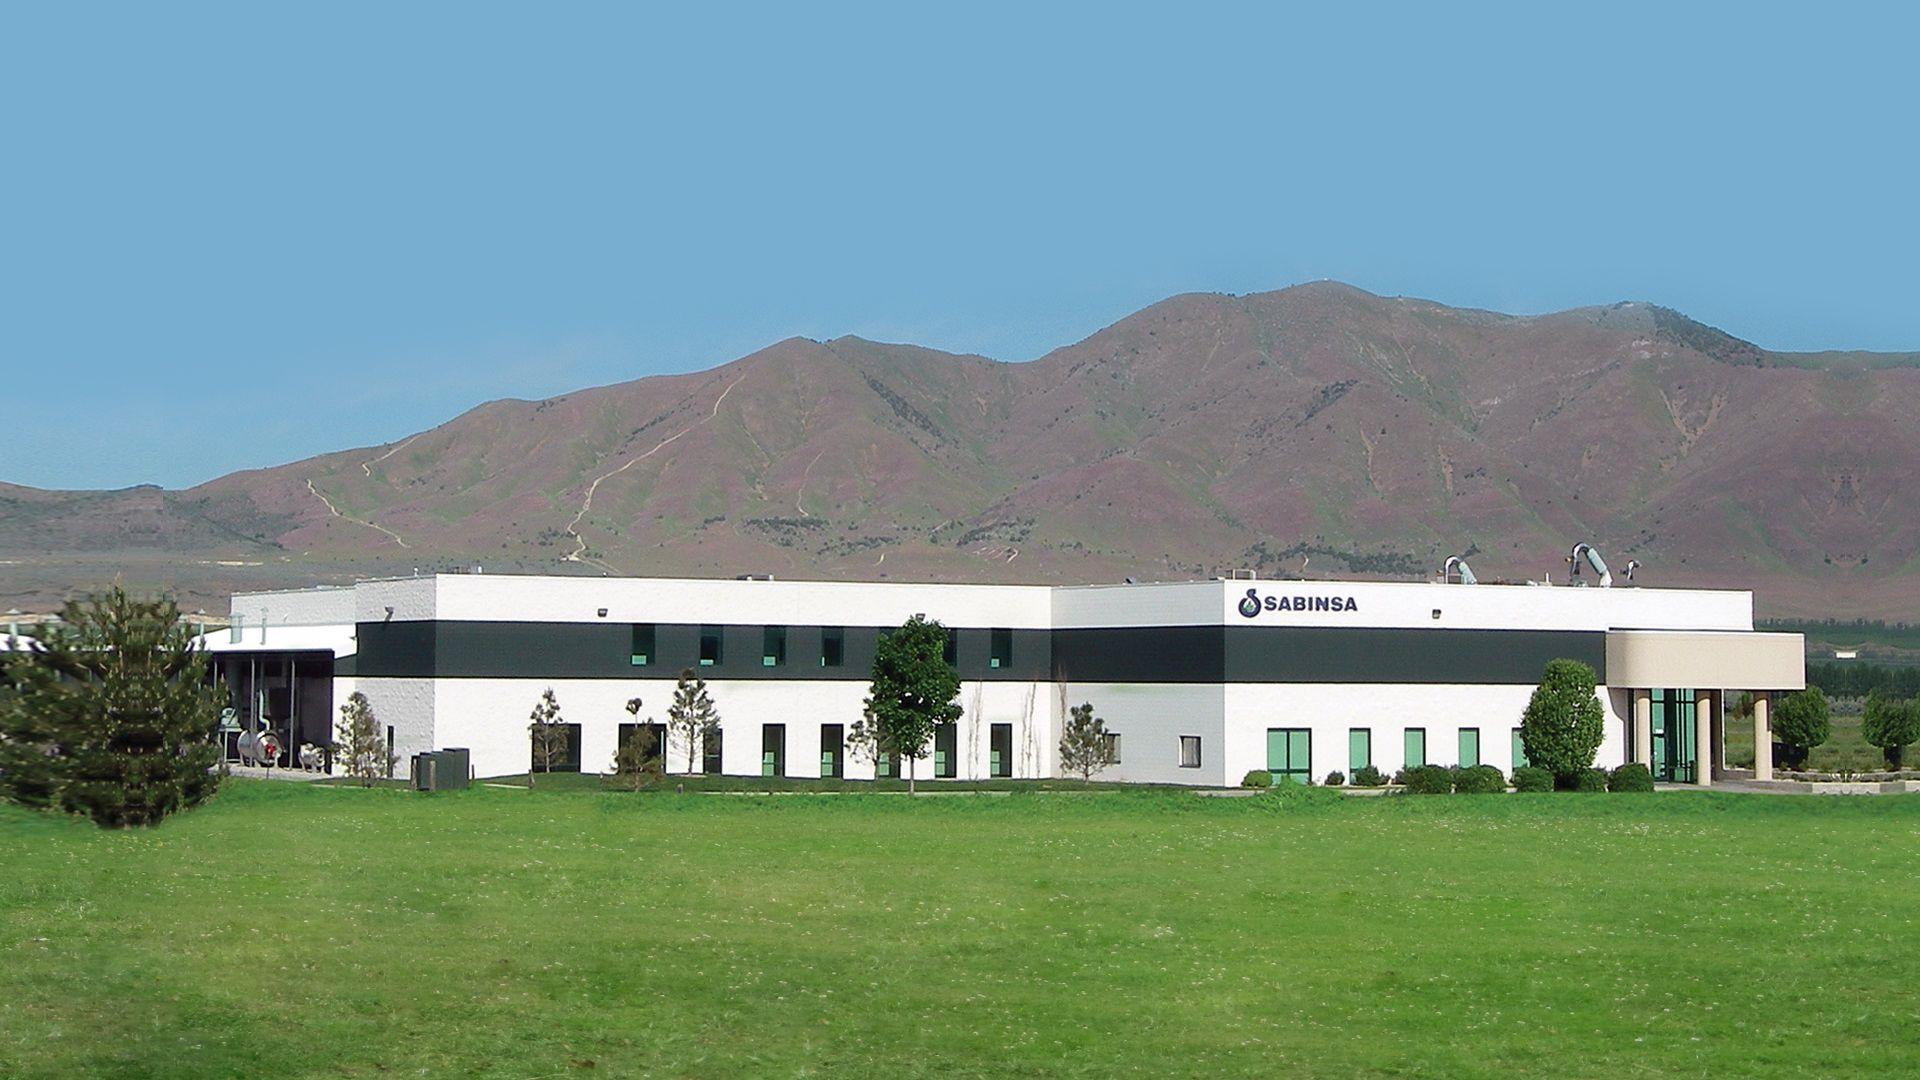 Sabinsa Manufacturing Utah